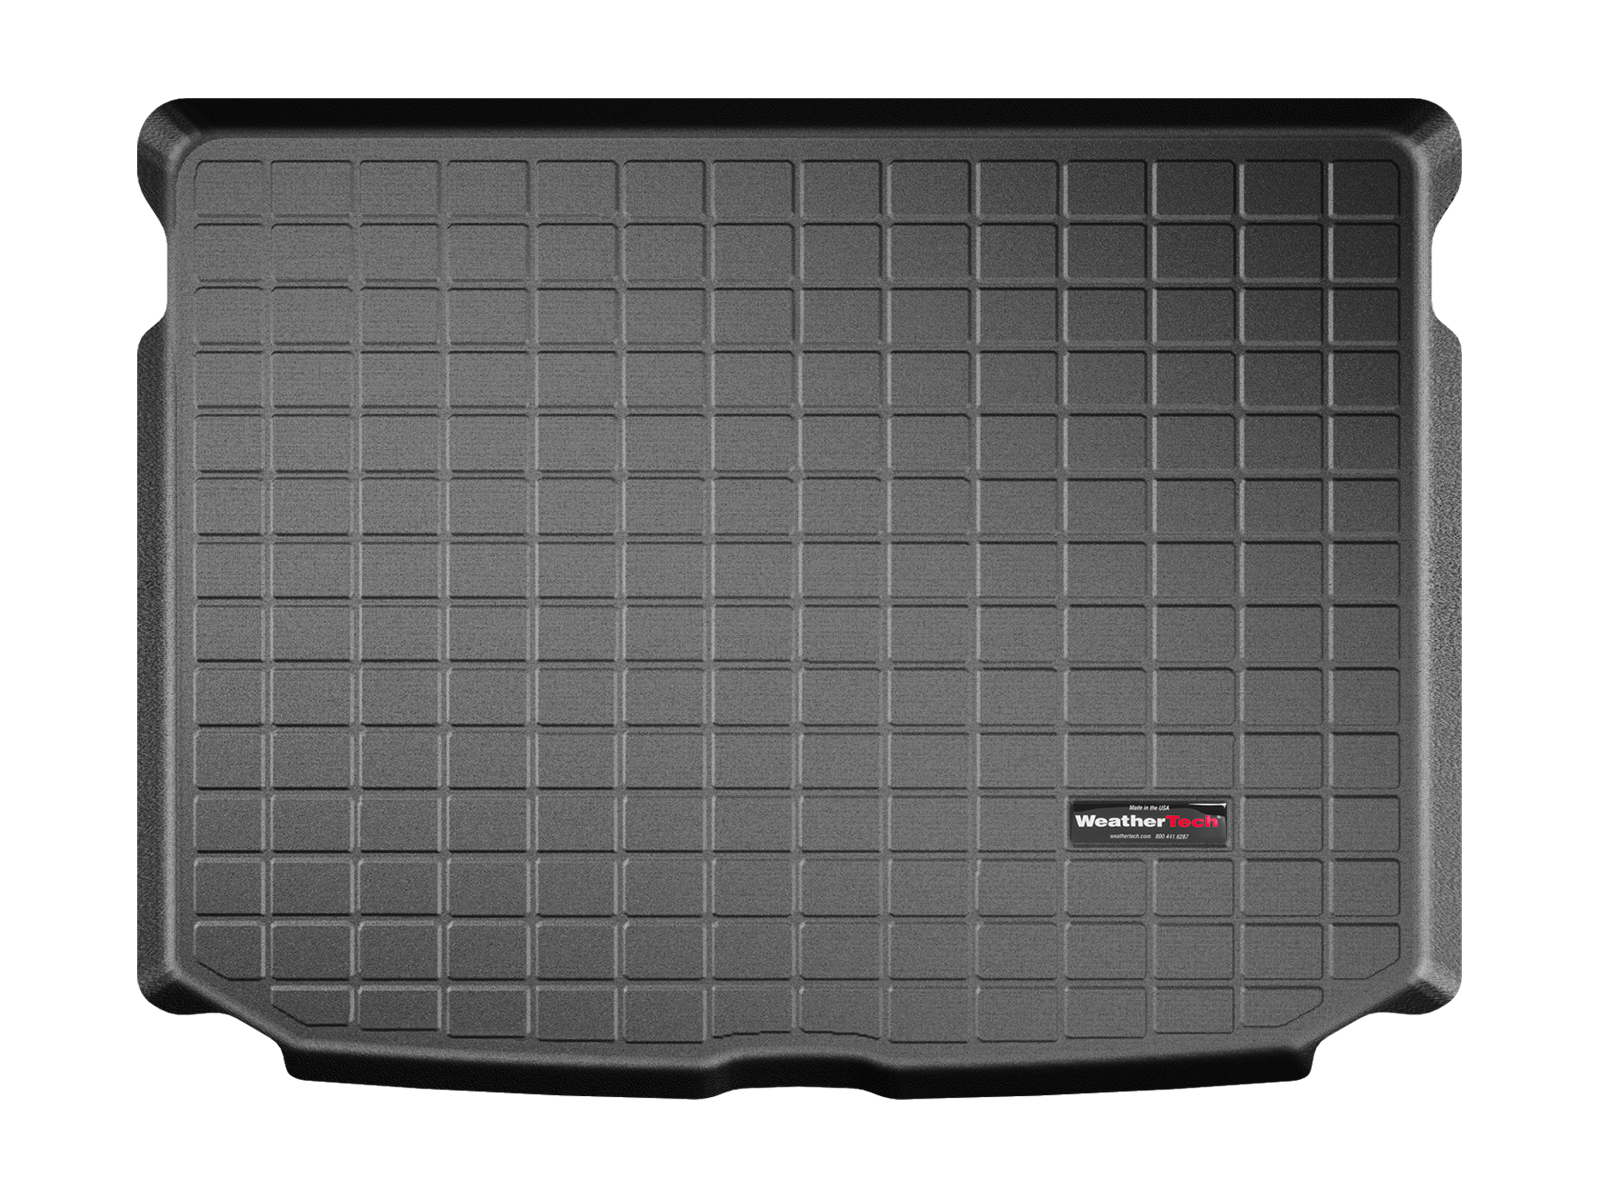 Audi A3 S3 2012>2012 Vasca proteggi baule tappeto bagagliaio nero *16